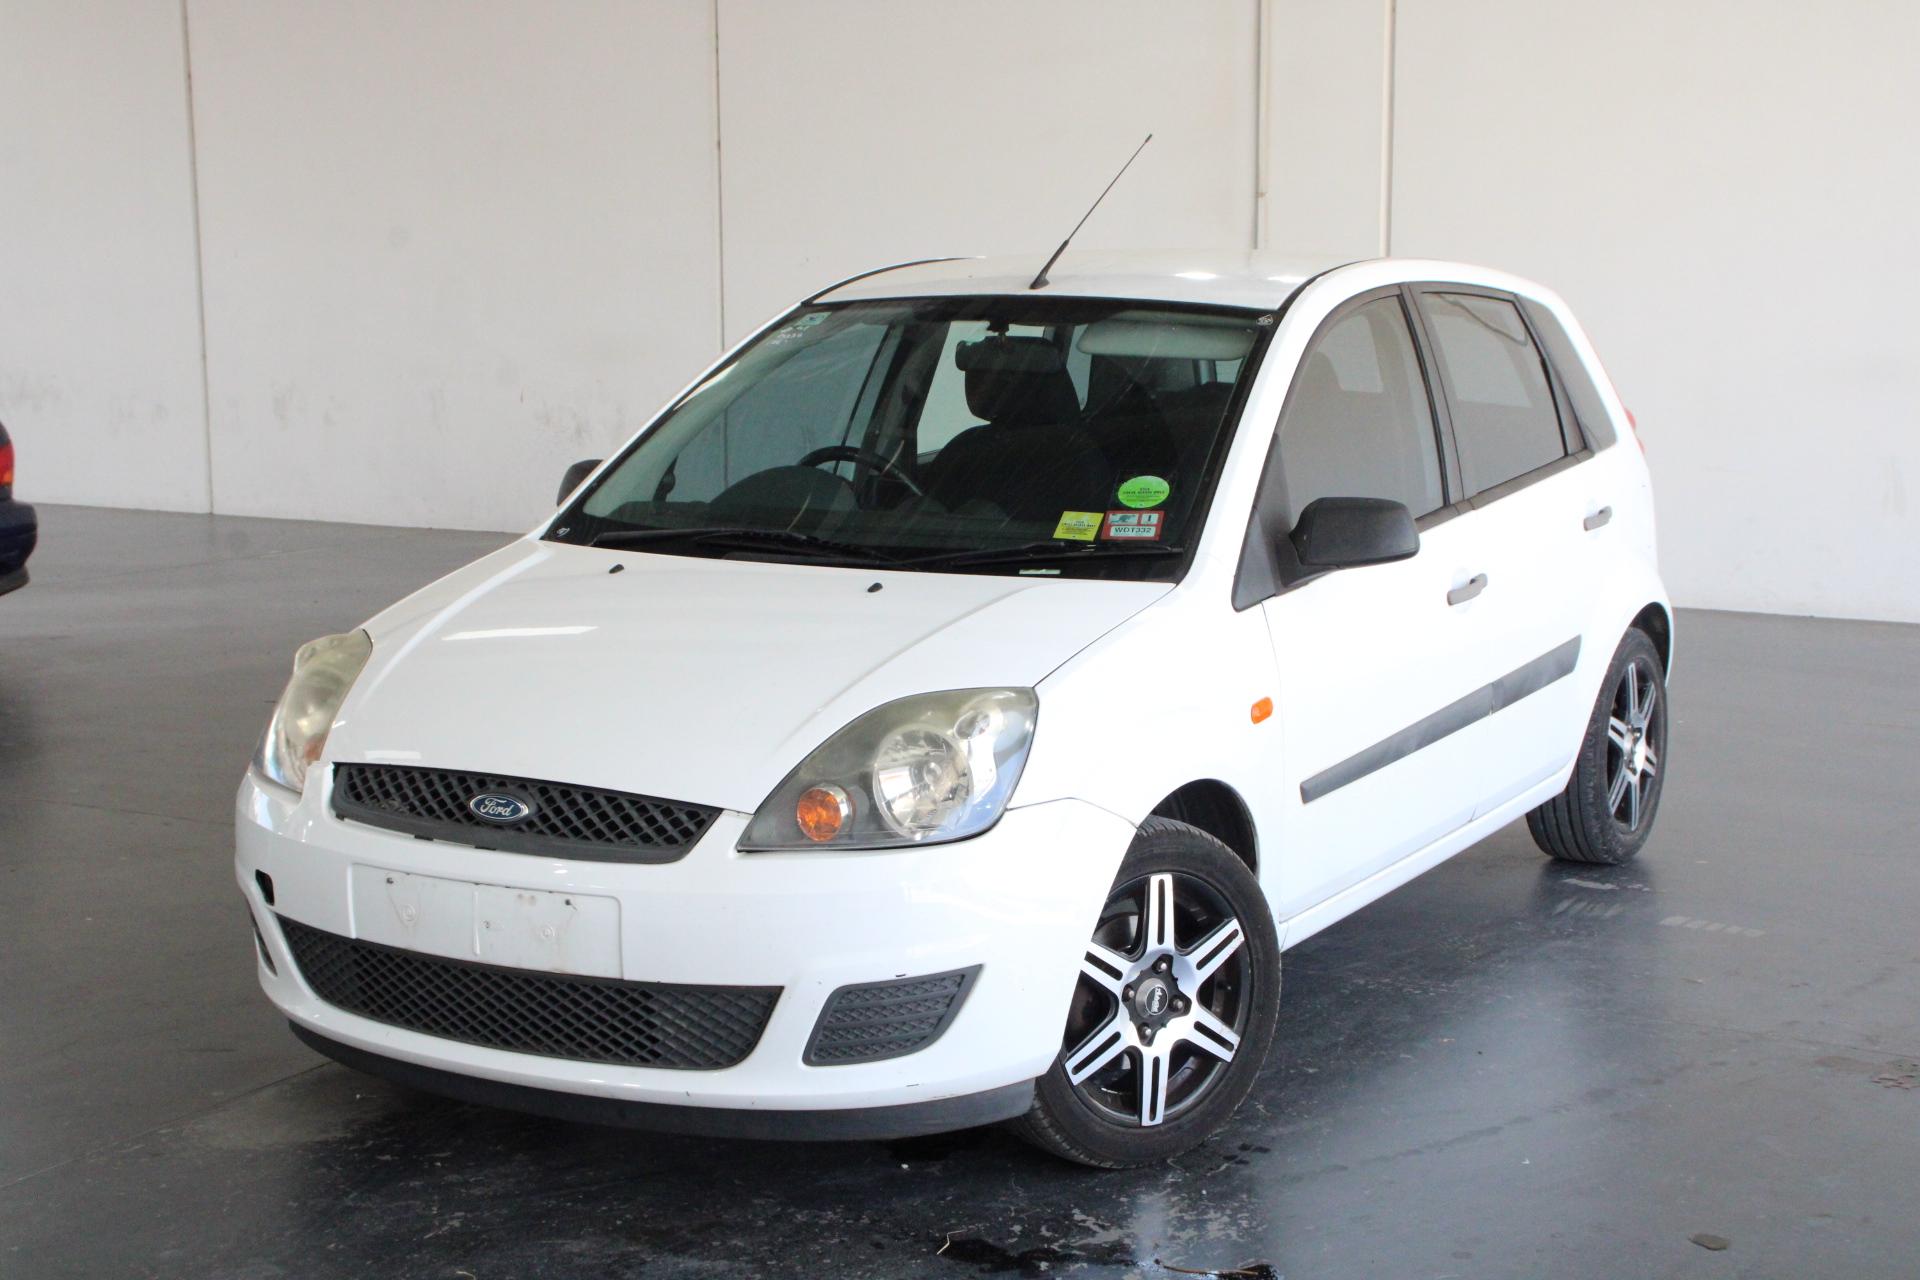 2007 Ford Fiesta LX WQ Automatic Hatchback